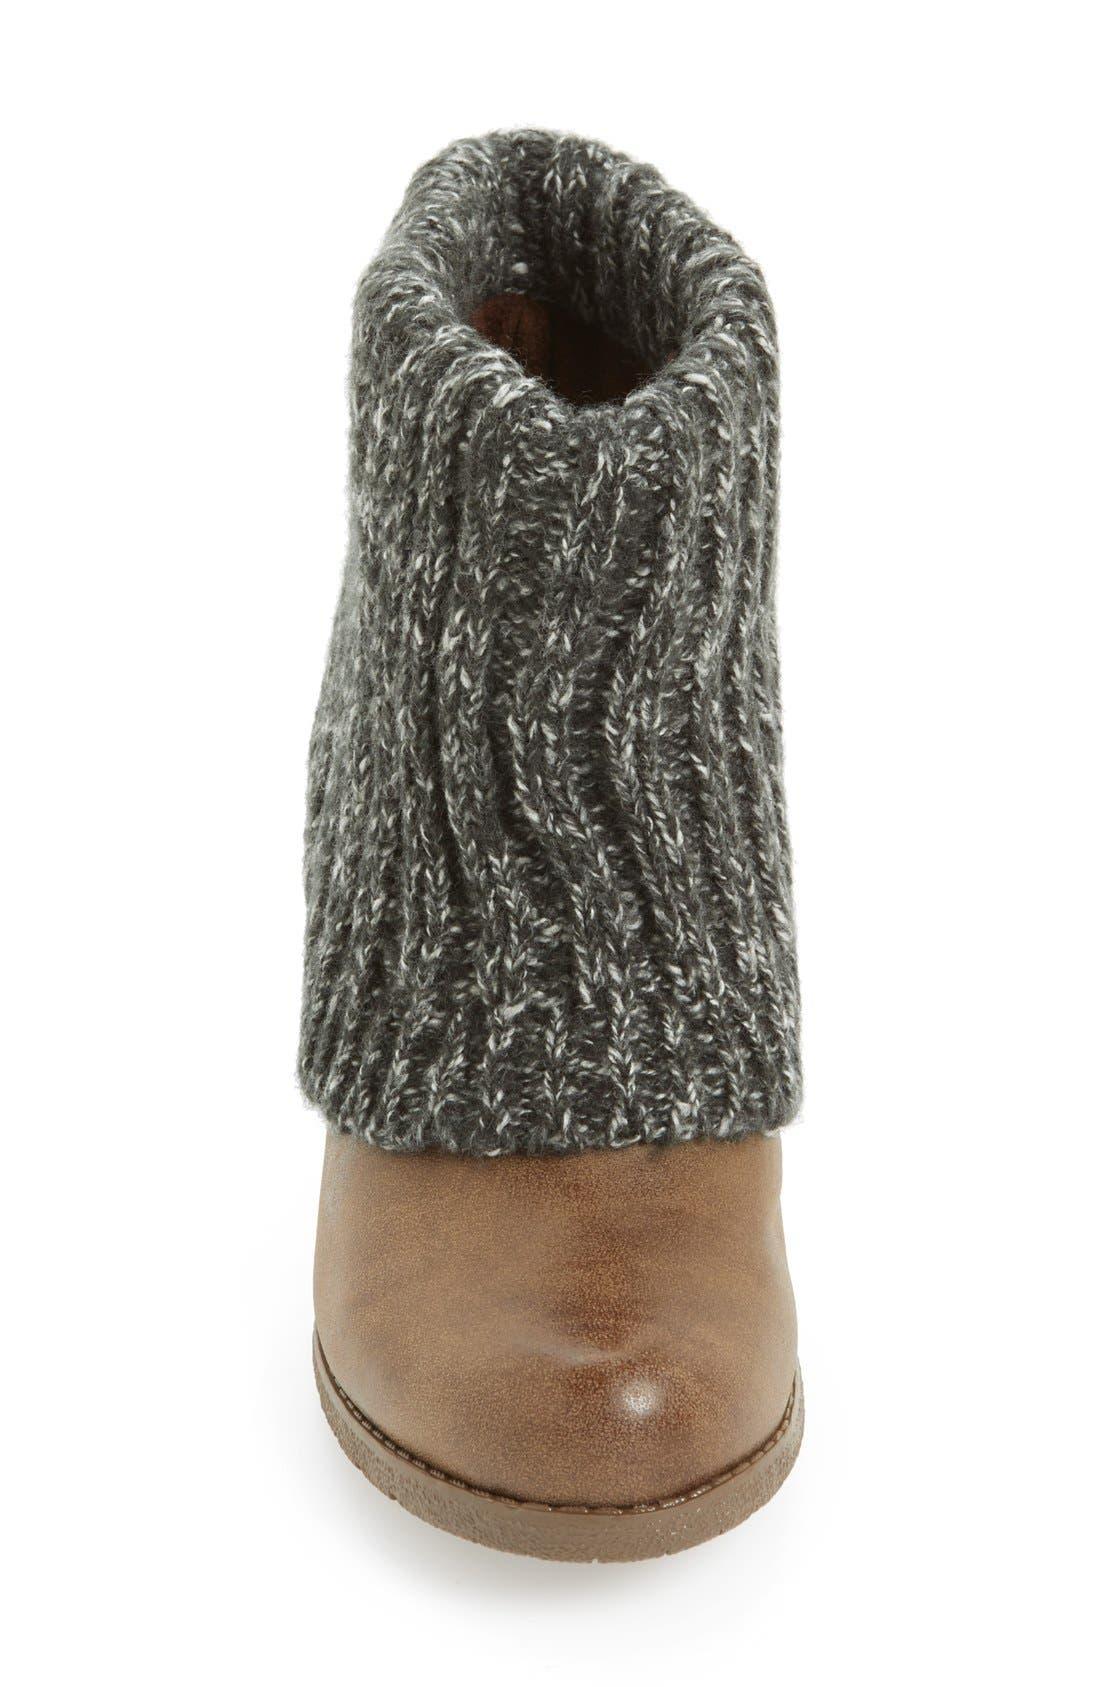 Alternate Image 3  - MUK LUKS 'Chris' Knit Cuff Bootie (Women)